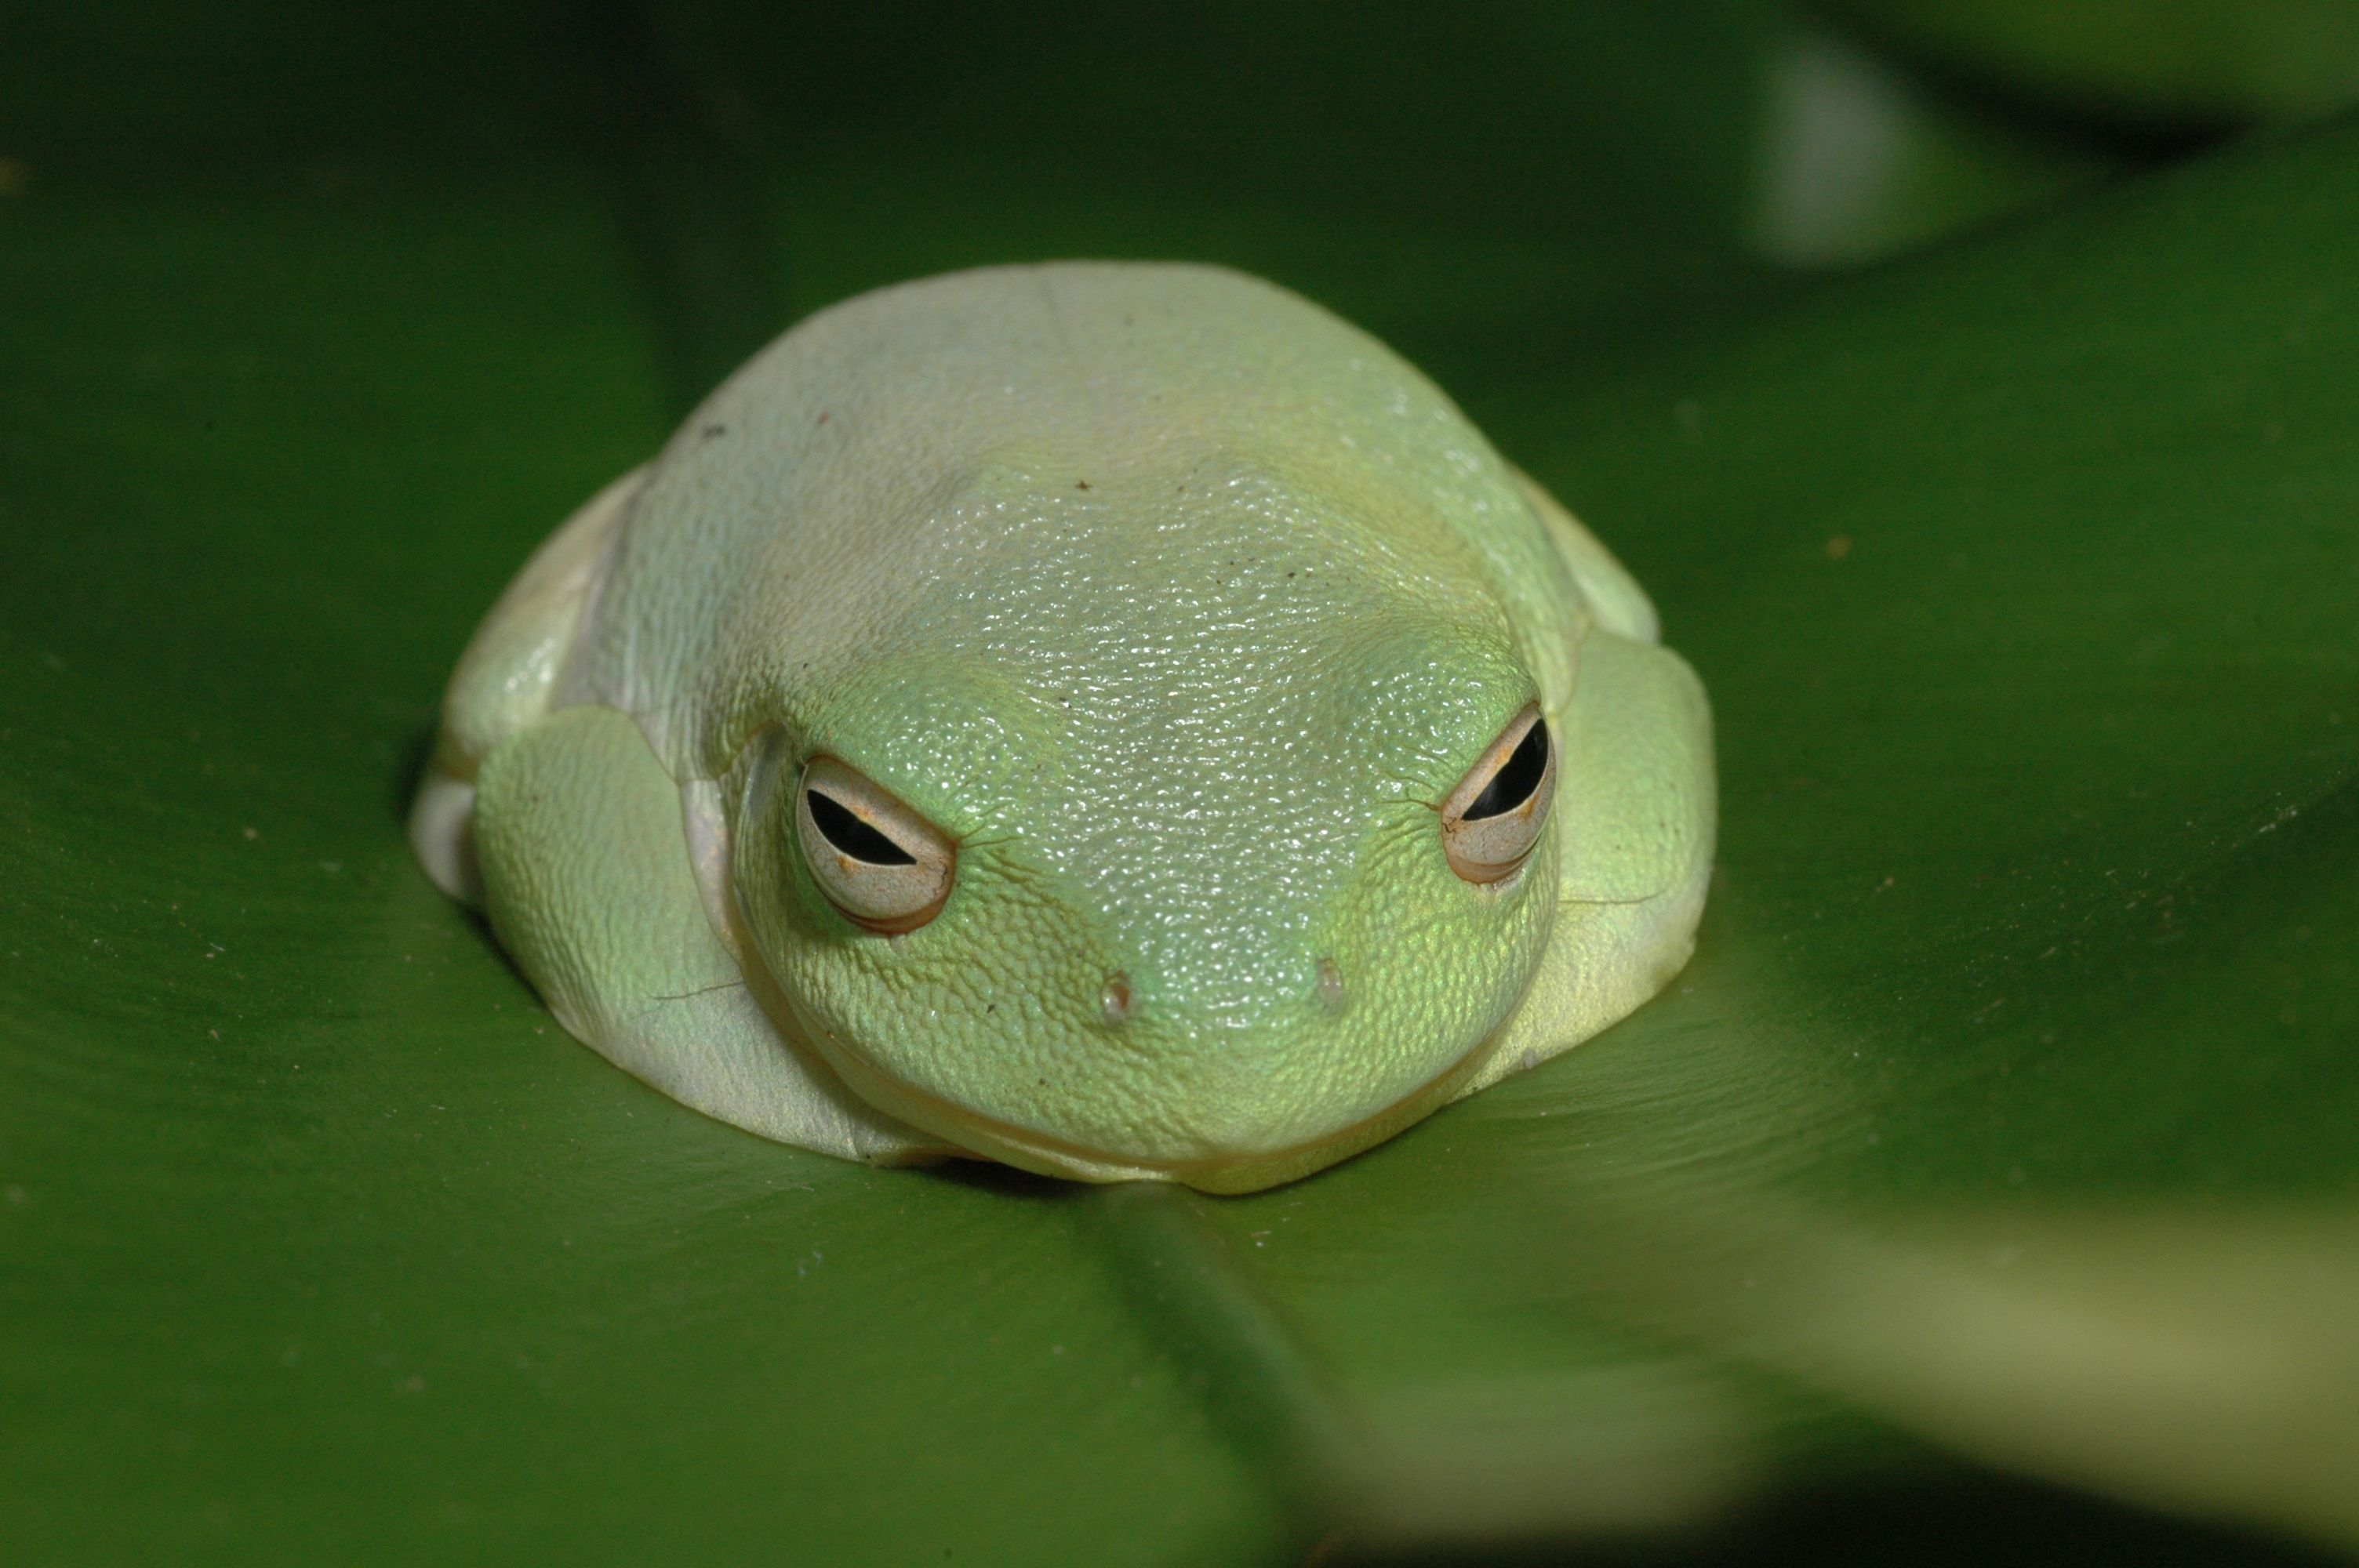 Red eyed tree frog reptiles amphibians but nooooo snakes pinter